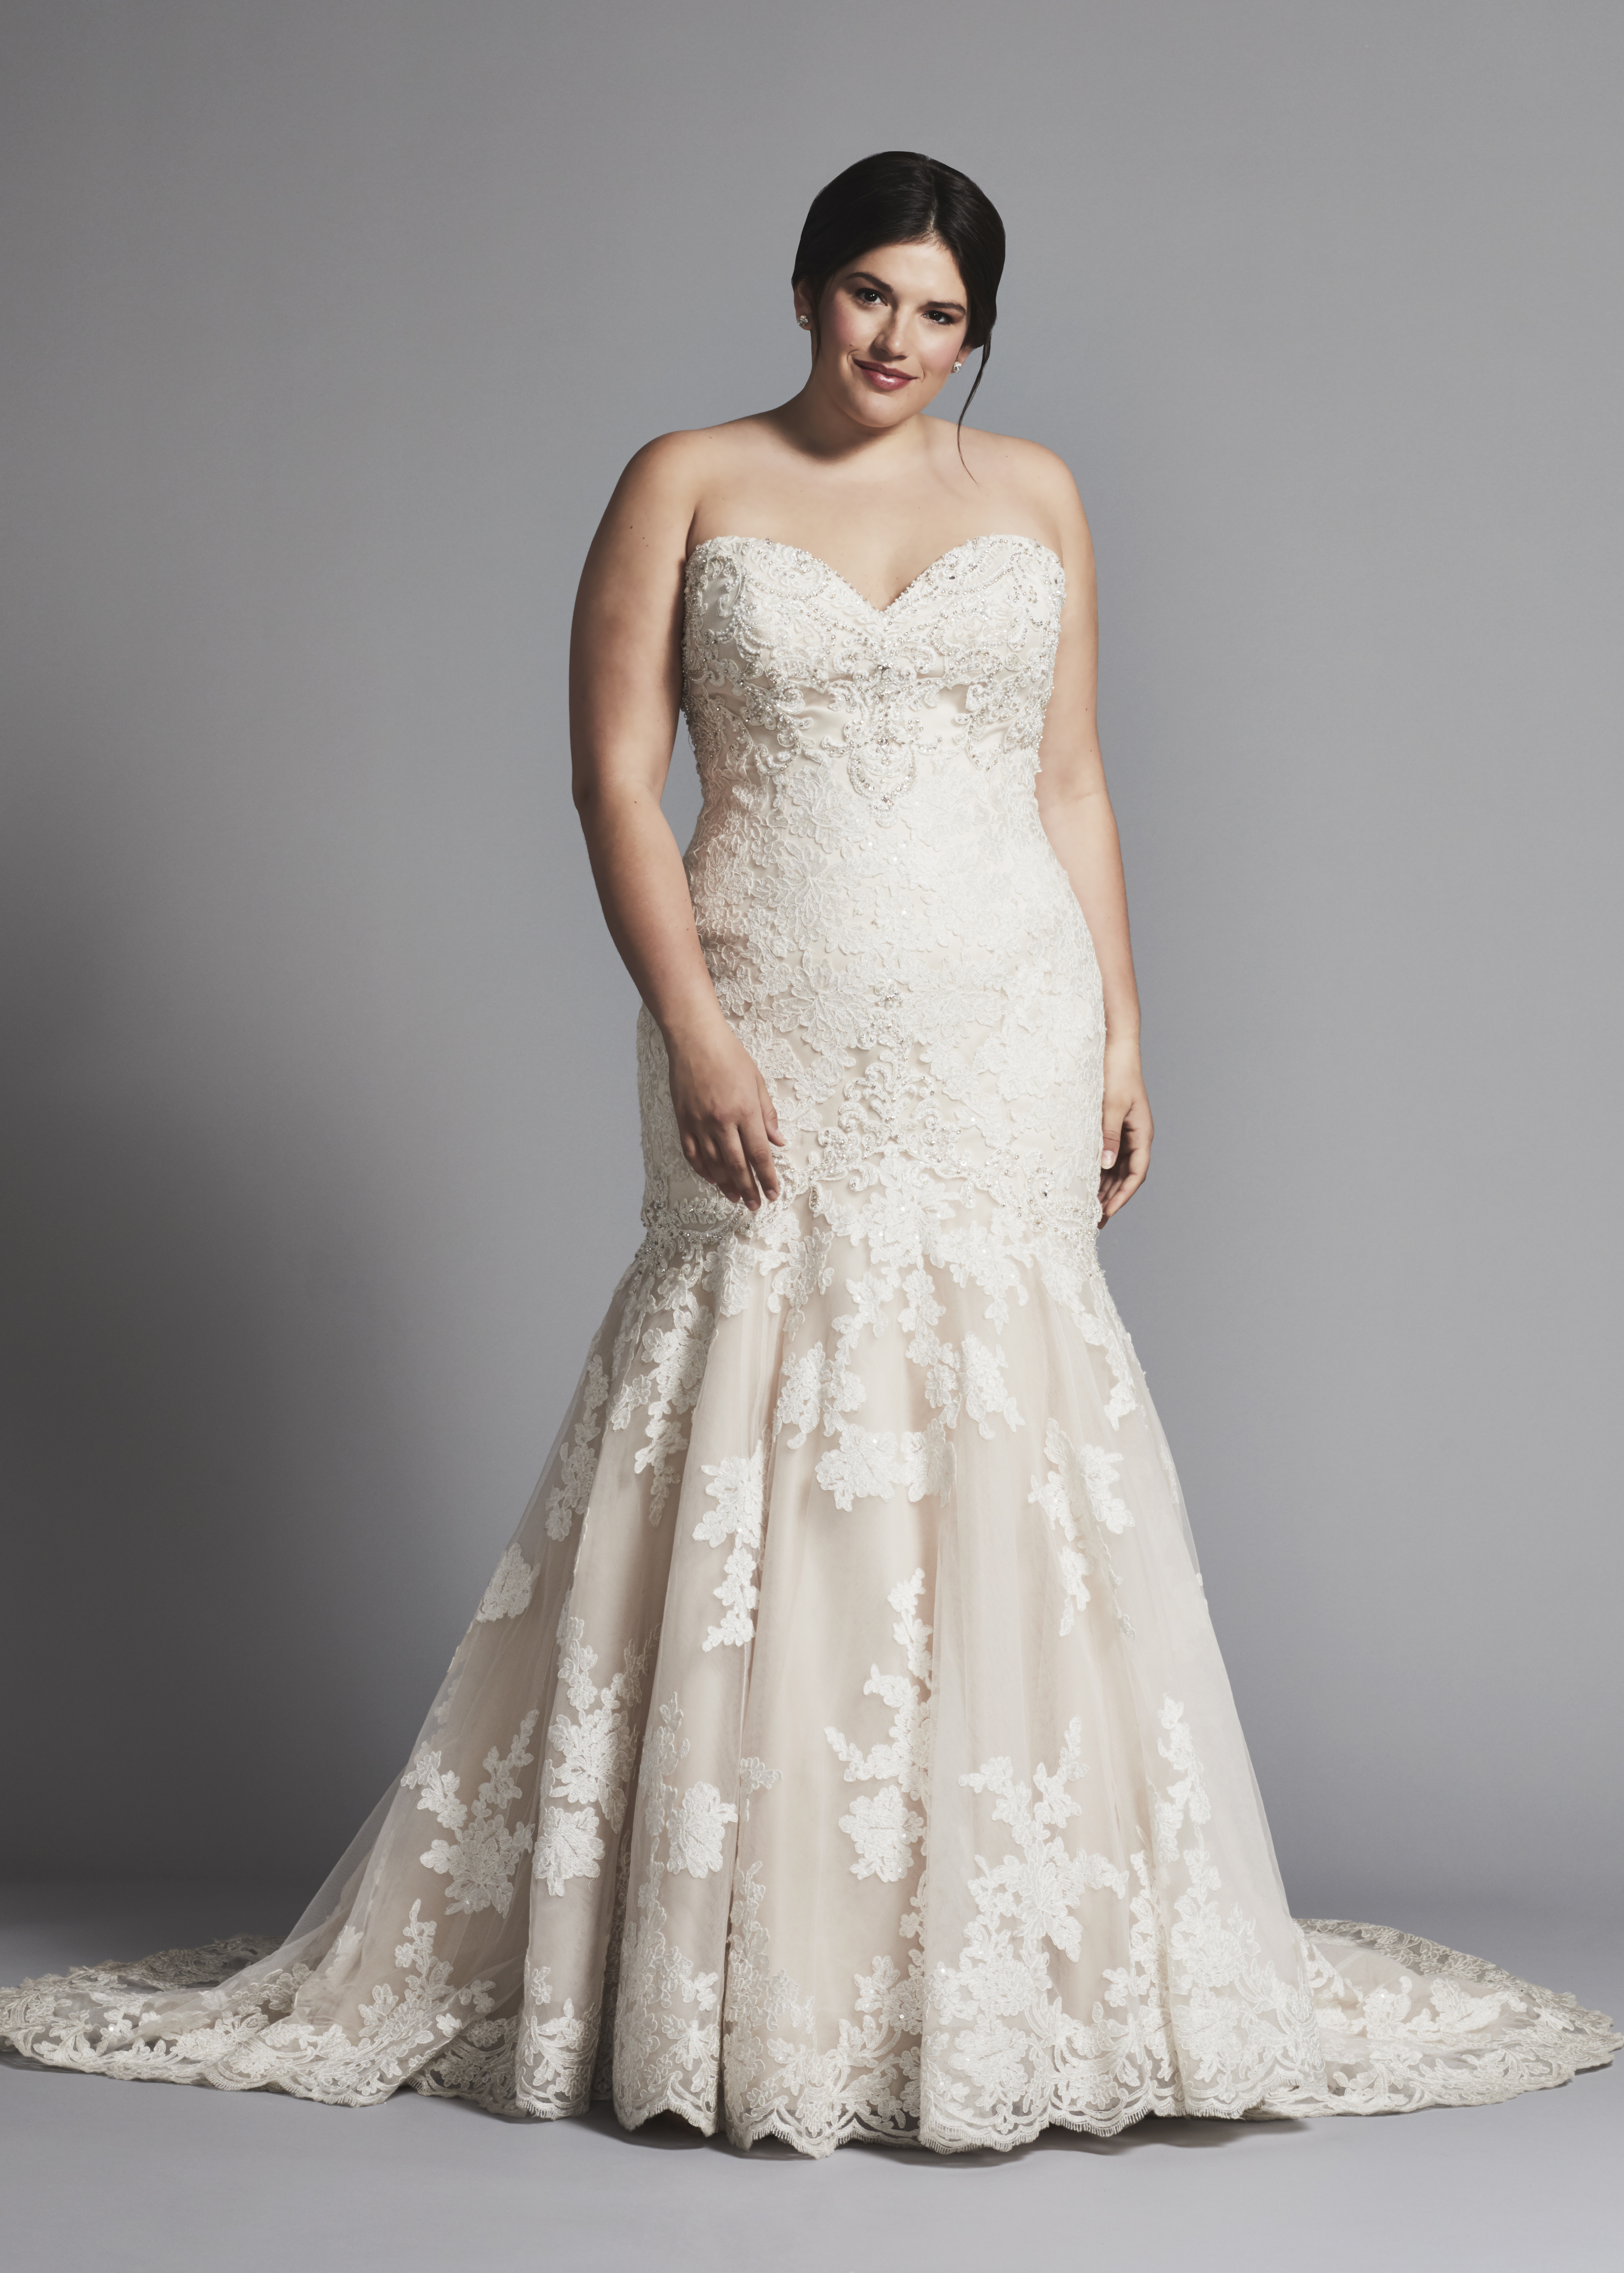 Strapless Lace Mermaid Wedding Dress | Kleinfeld Bridal